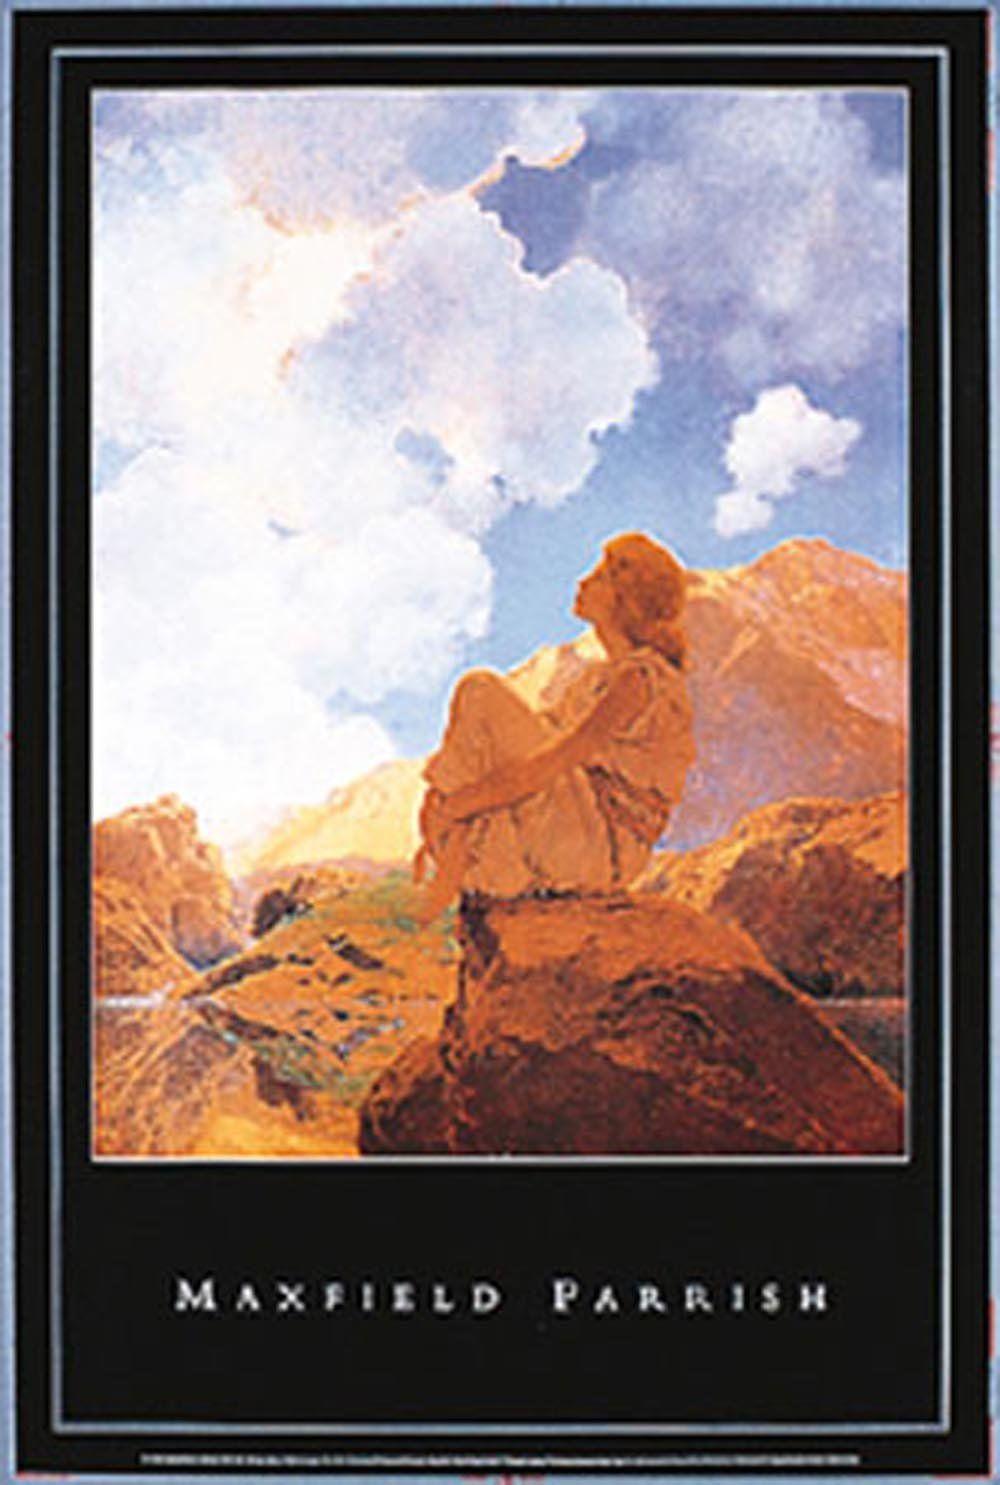 Empire 209054 Parrish, Max field - Morning, Spring - plakat - 61 x 91,5 cm